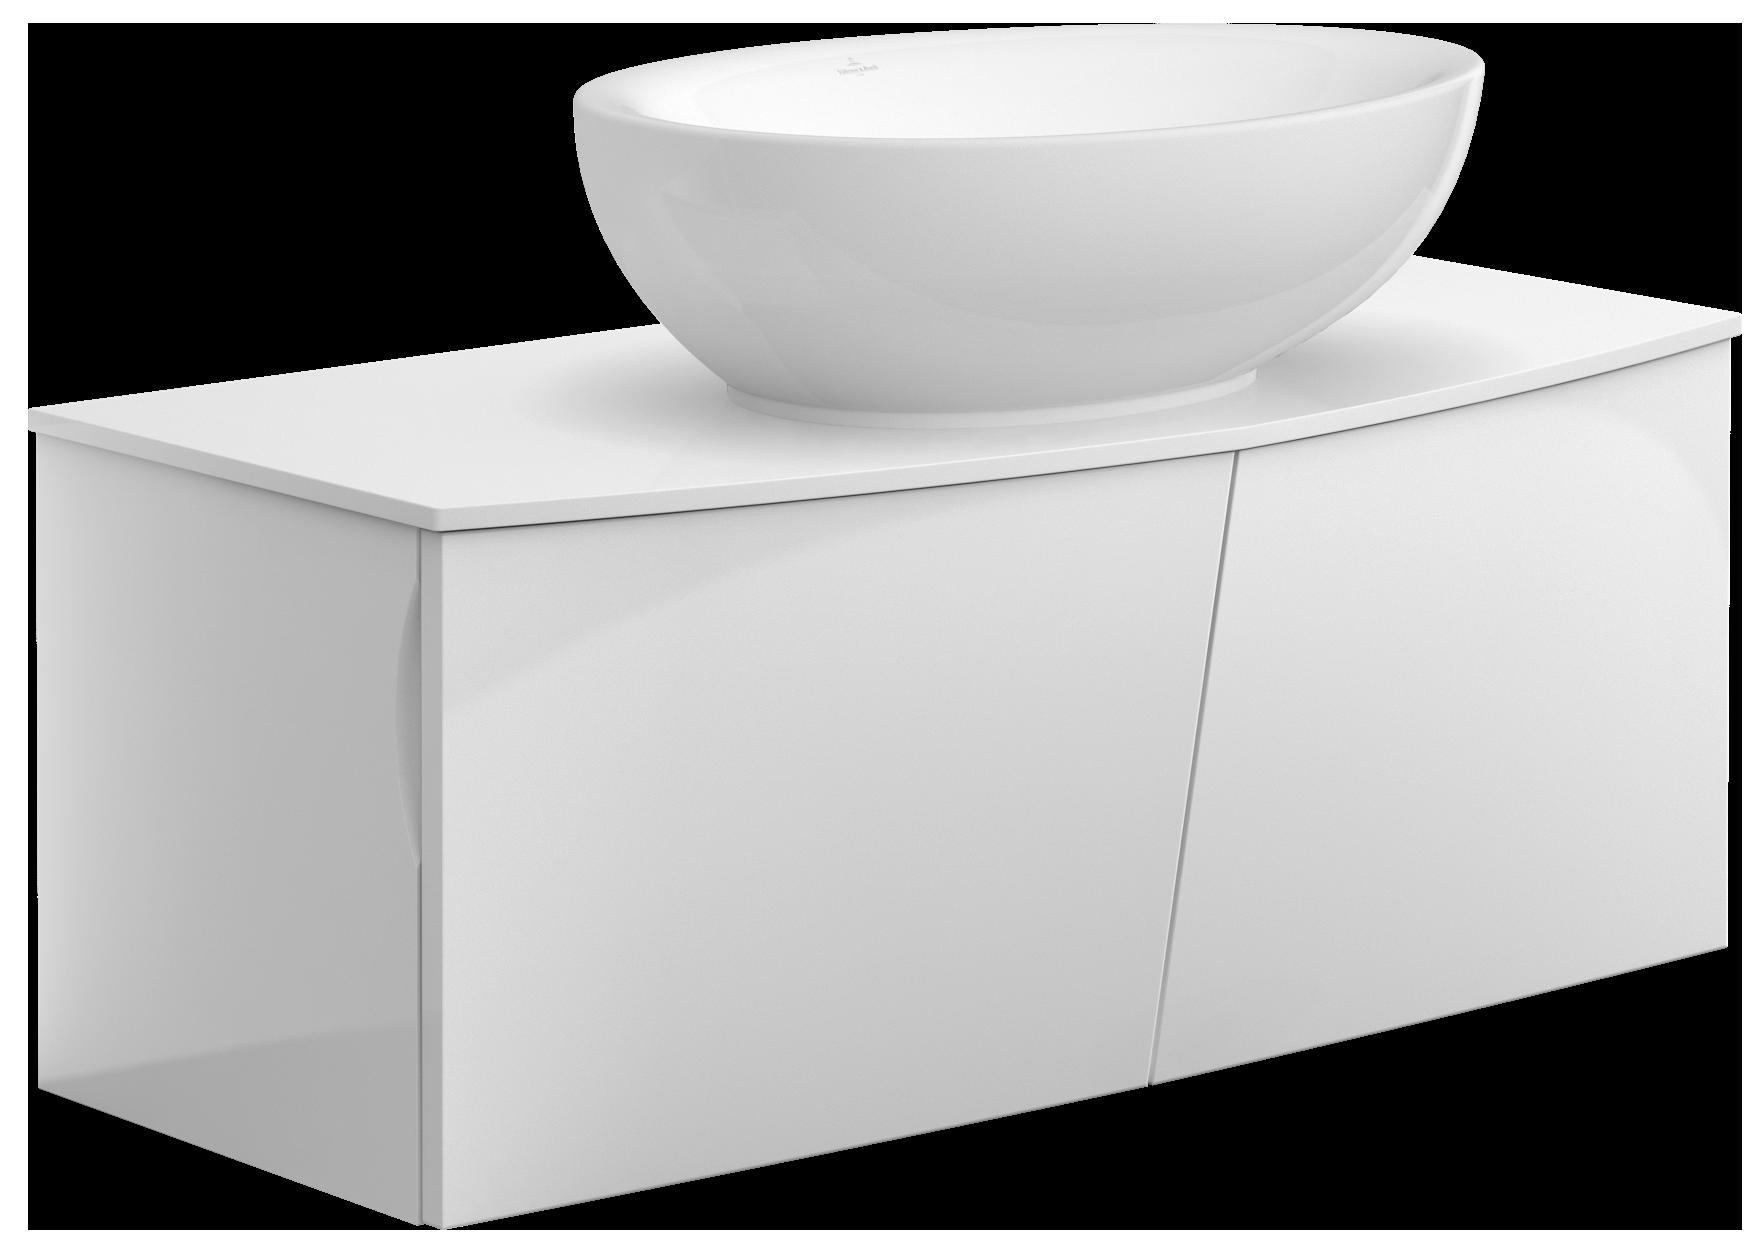 aveo new generation waschtischunterschrank a845e2. Black Bedroom Furniture Sets. Home Design Ideas